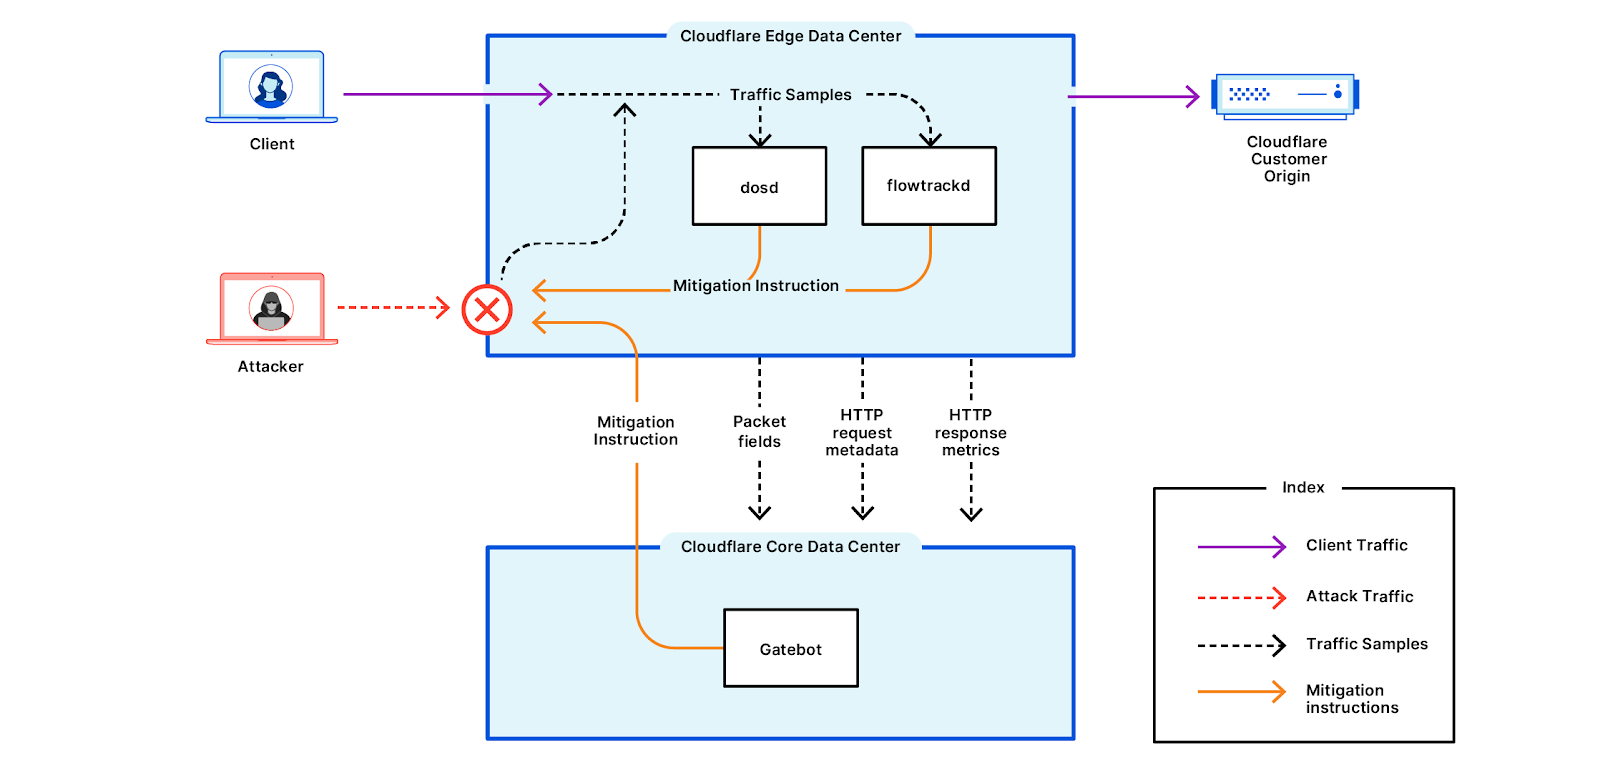 A conceptual diagram of Cloudflare DDoS mitigation systems